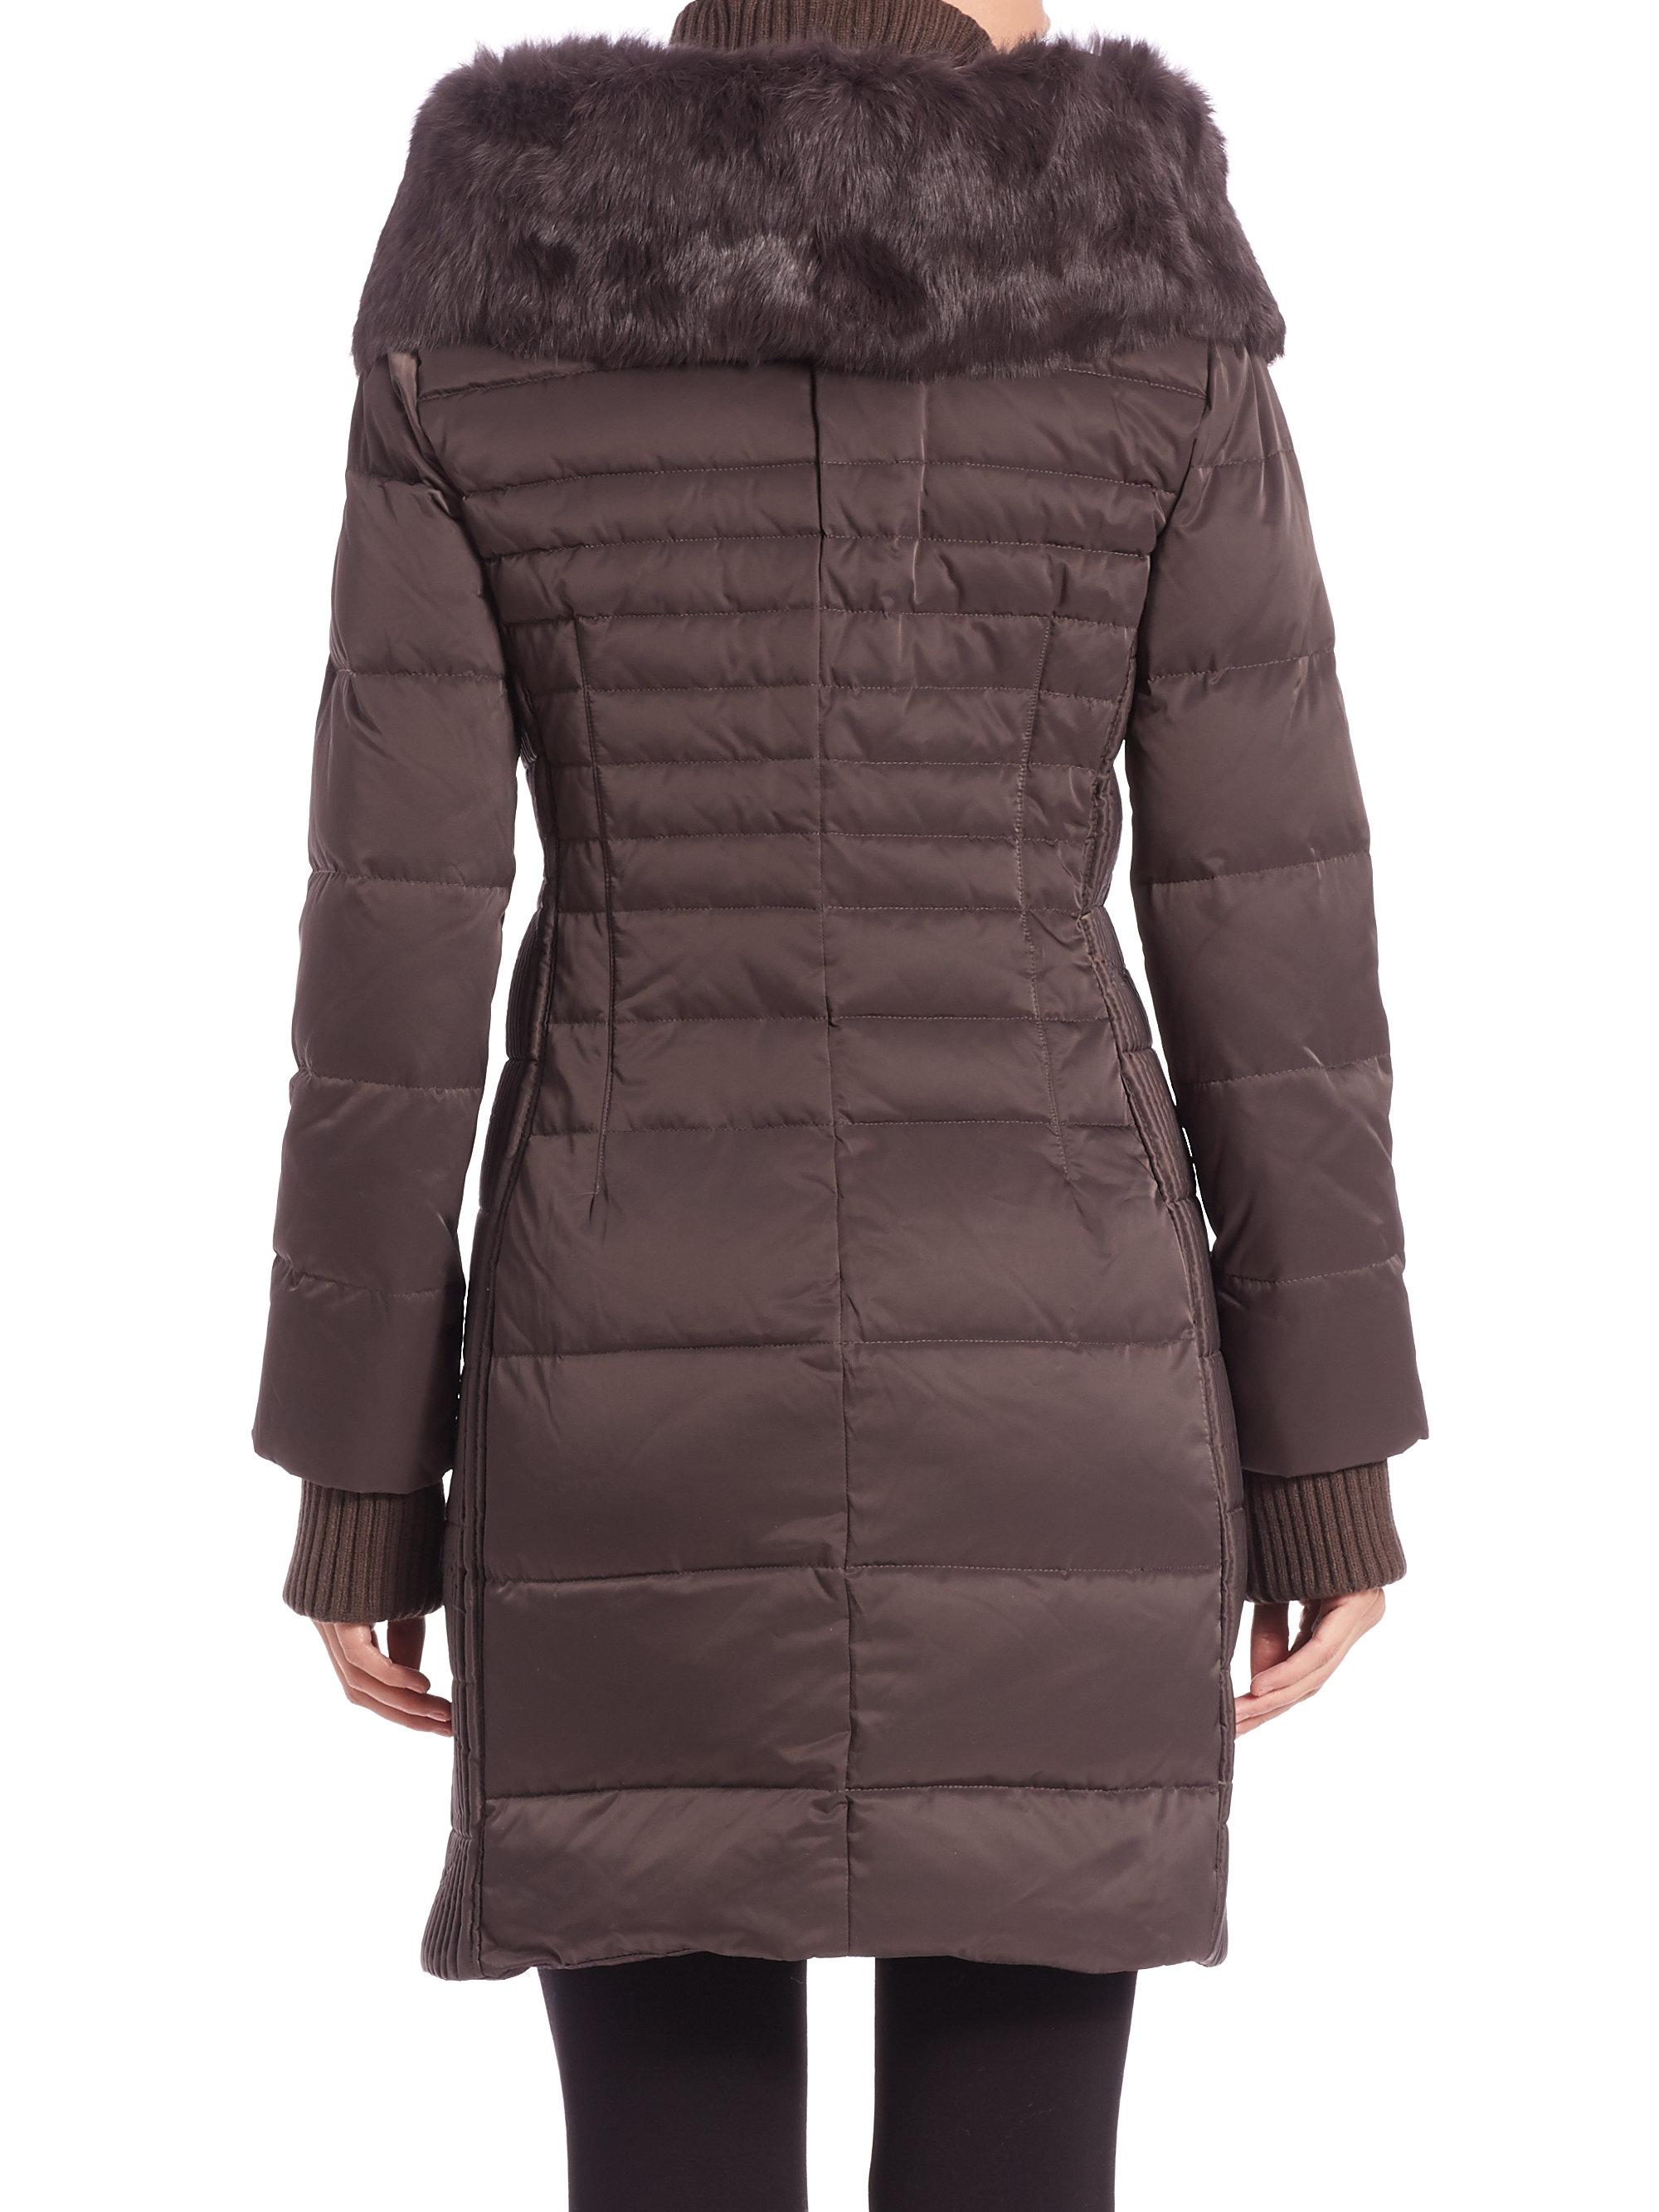 Elie Tahari Paula Fur Trimmed Puffer Coat In Brown Lyst